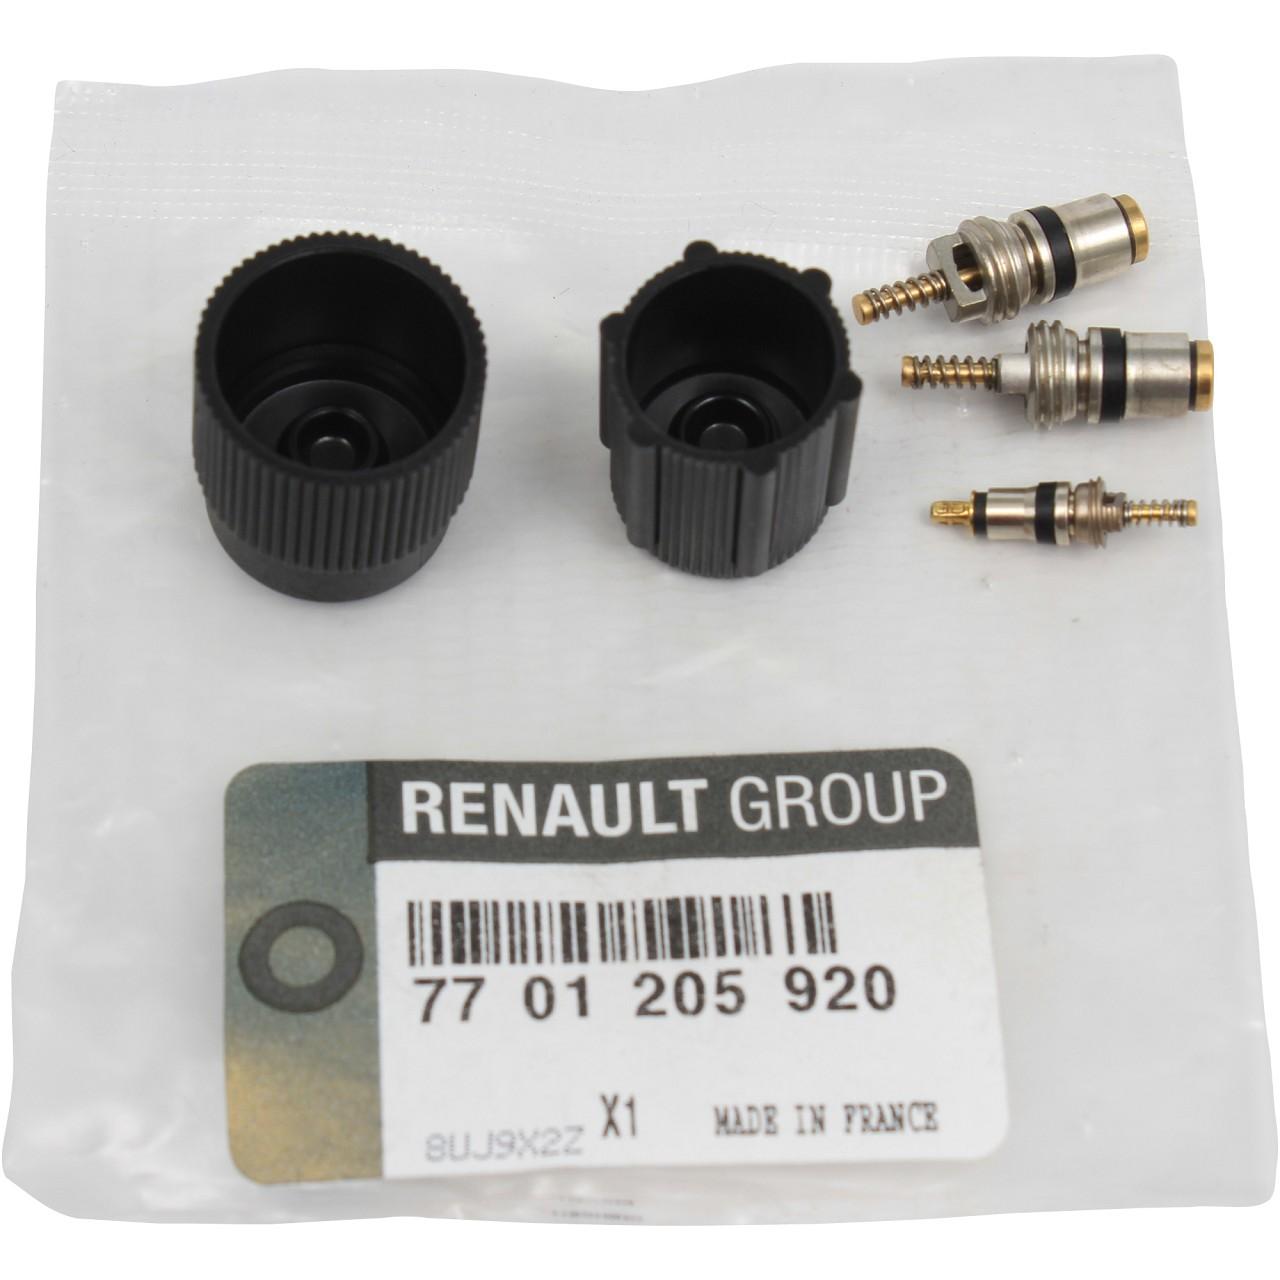 ORIGINAL Renault Ventil Klimaanlage Druckleitungsventil Kangoo 7701205920